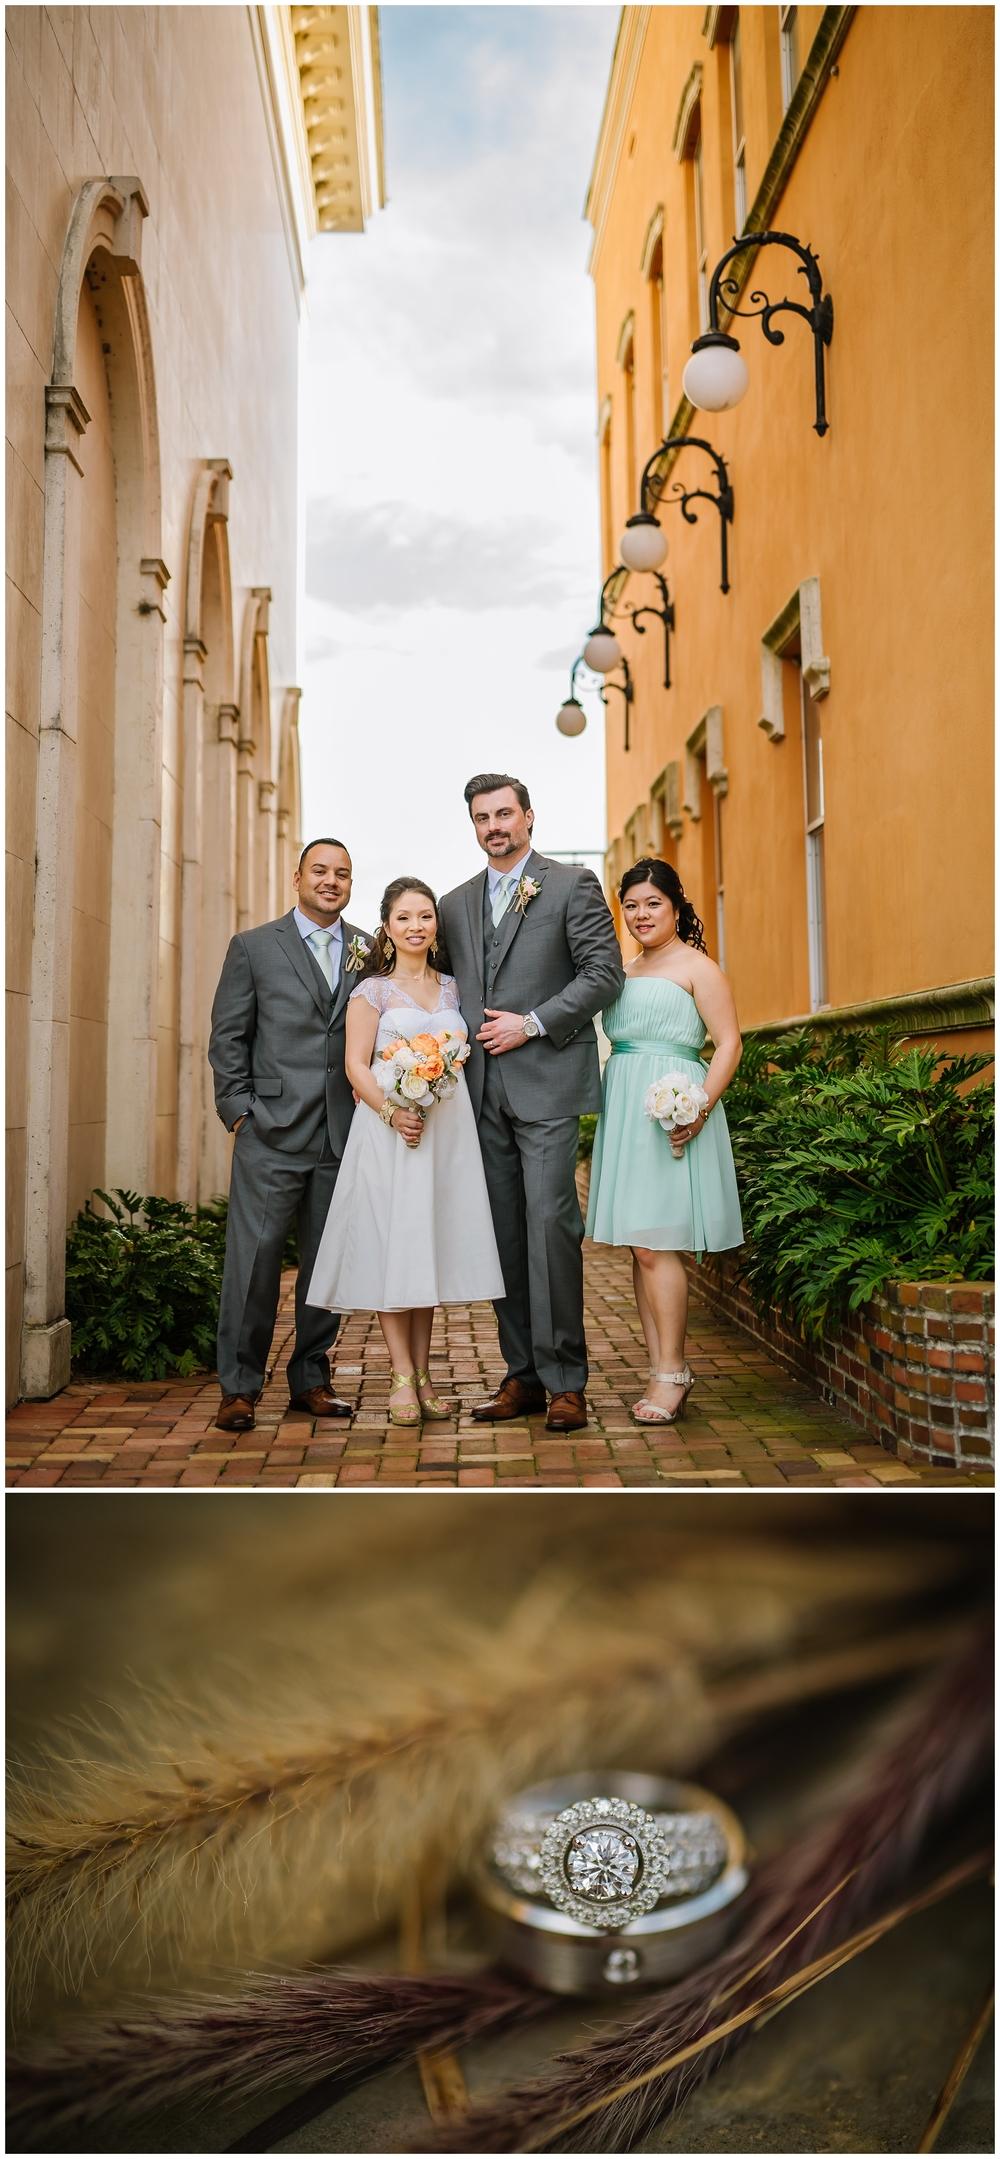 tampa-wedding-photographer-winthrop-barn-ivy-wall-portraits_0173.jpg